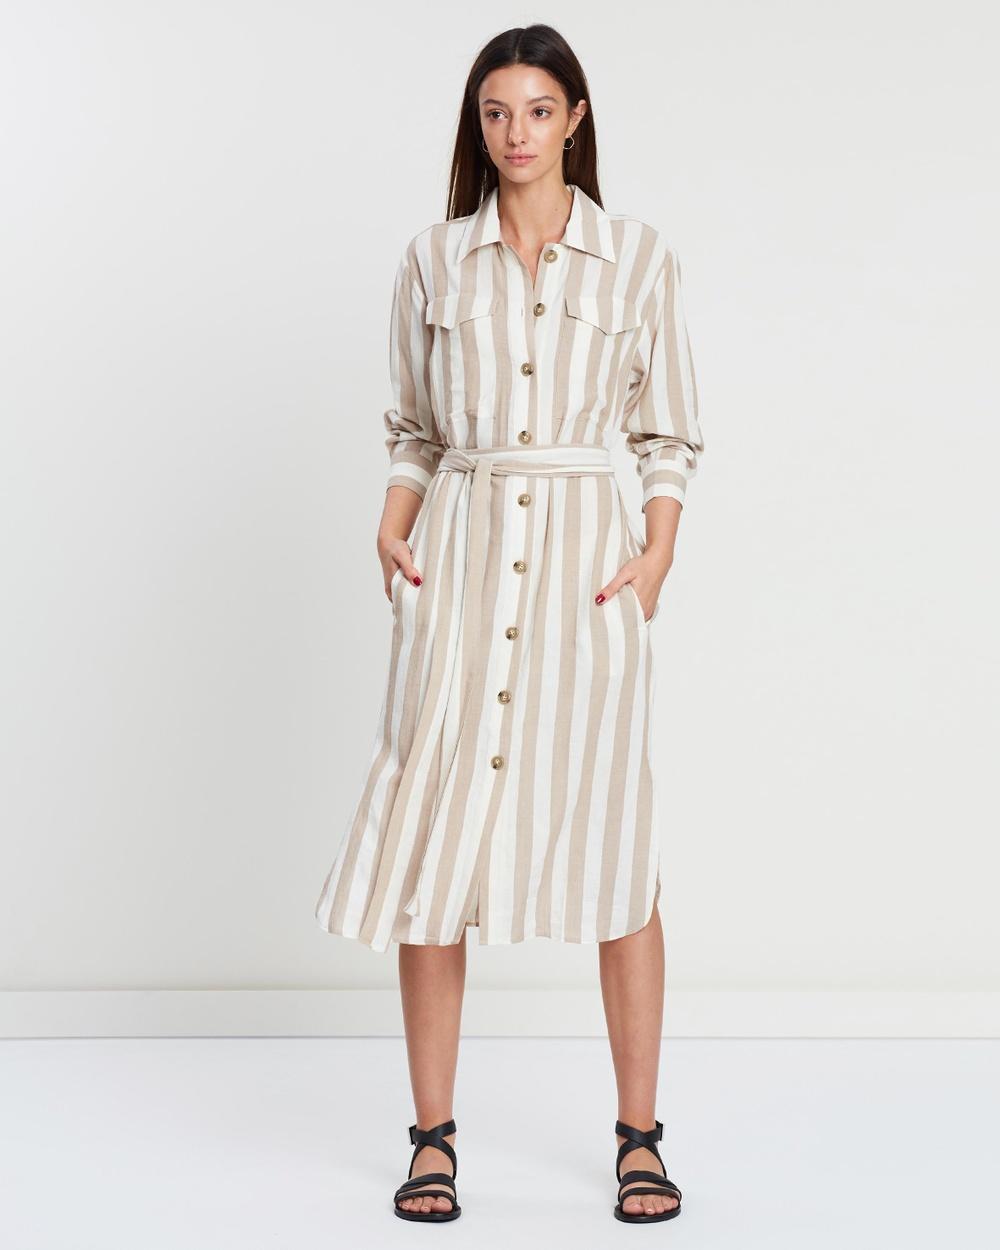 Incu Collection Tan & Ecru Clinton Shirt Dress